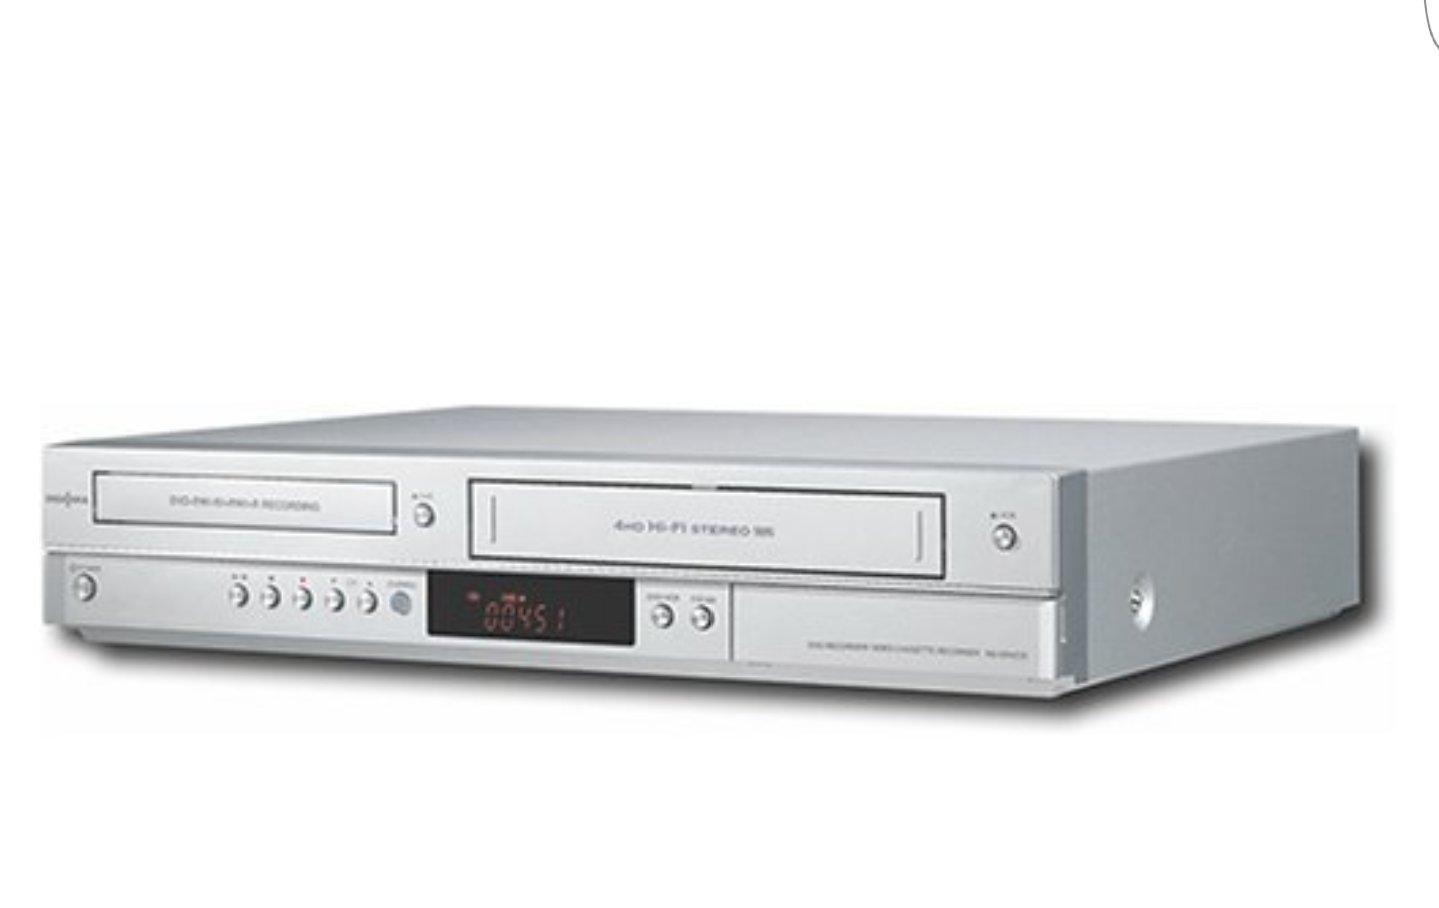 Insignia Progressive-Scan Multiformat DVD-R/-RW/+R/+RW DVD Recorder/Hi-Fi VCR Combo